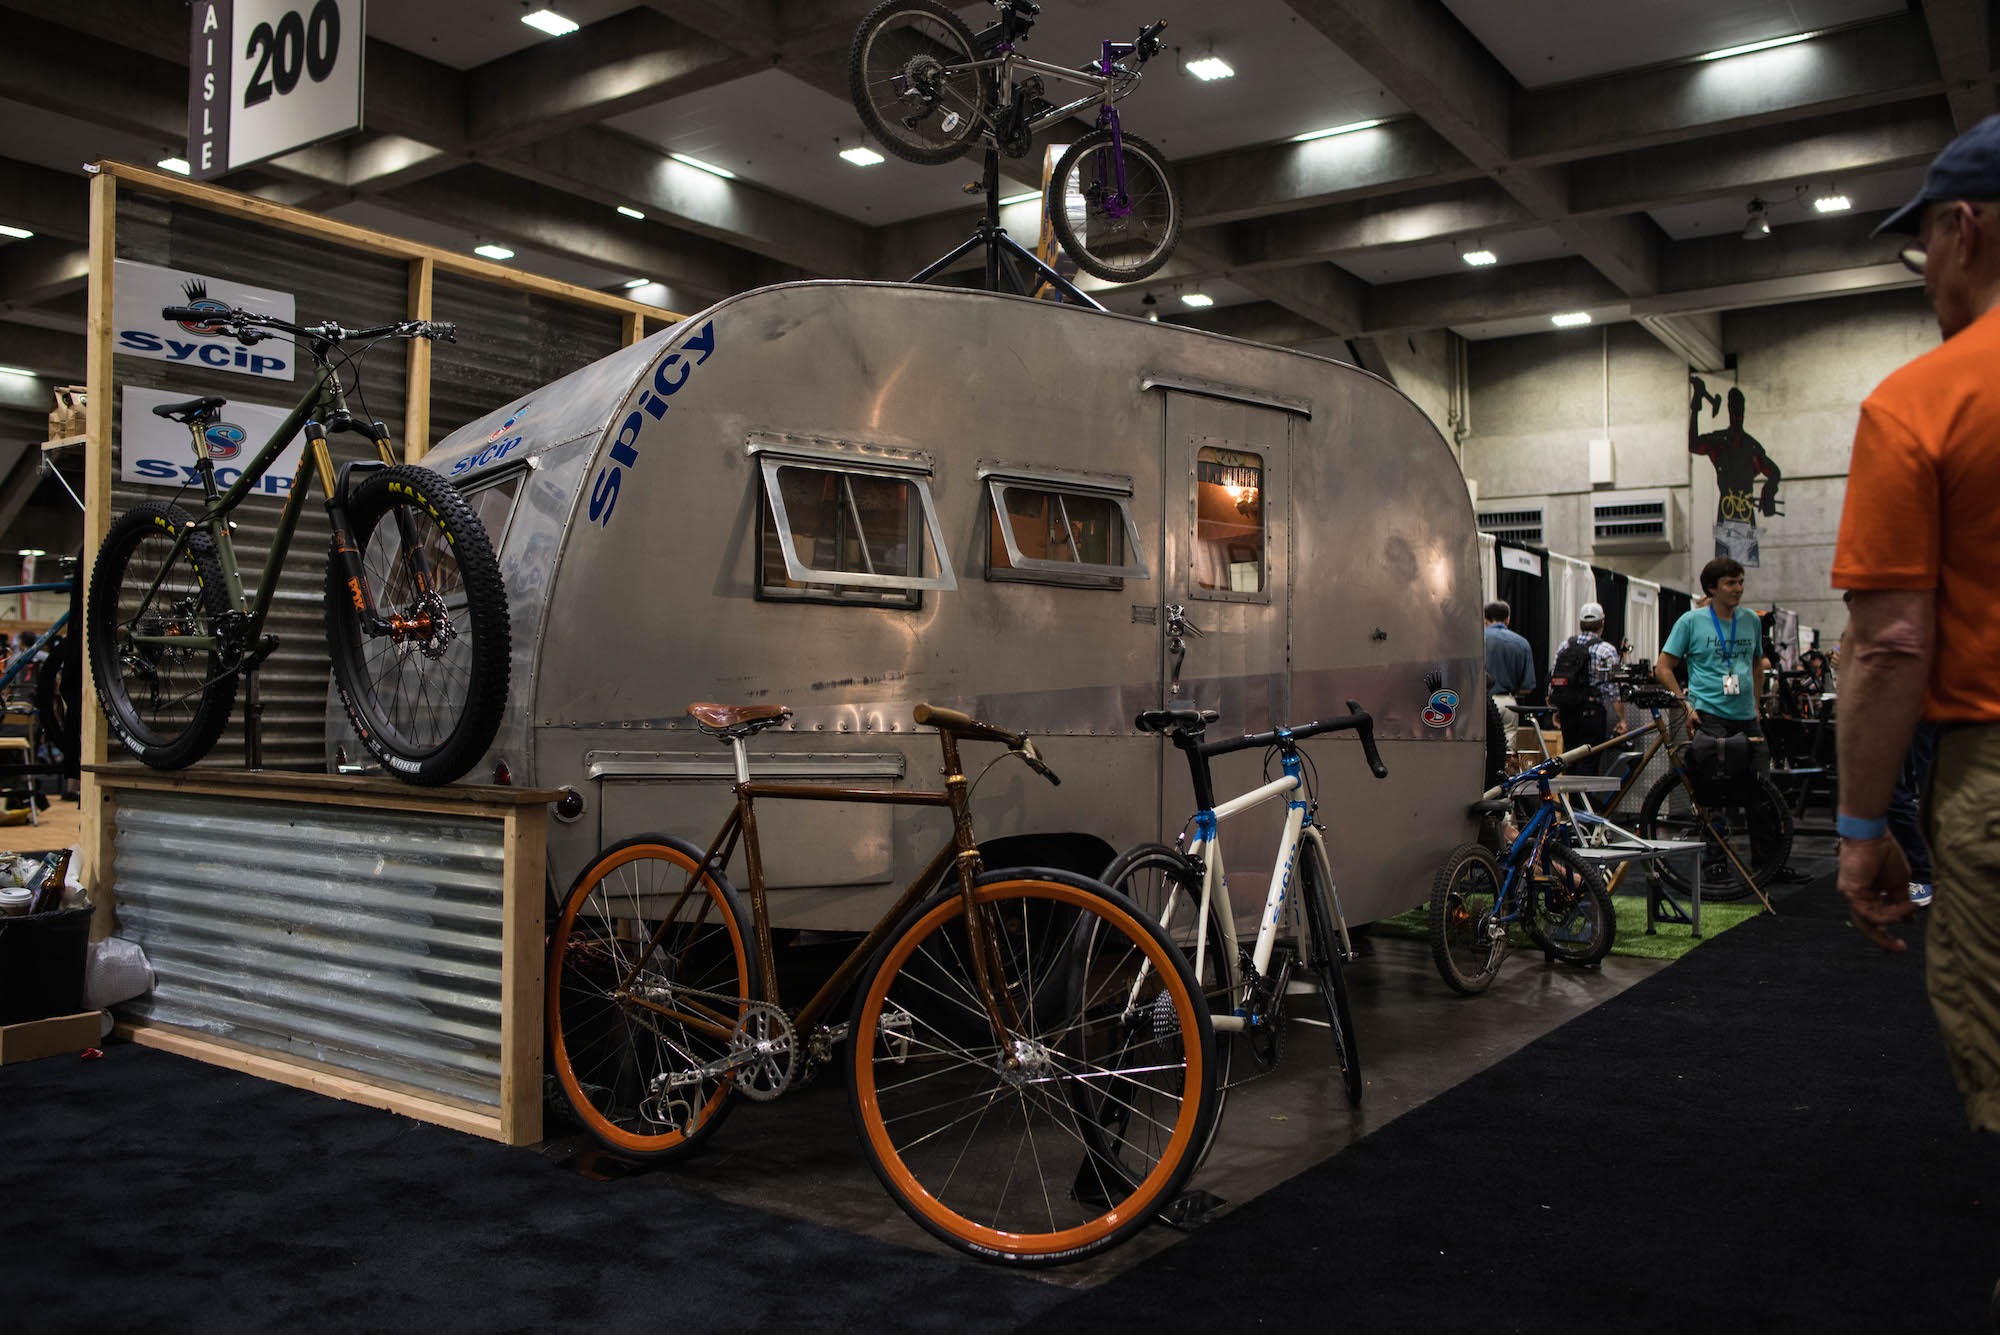 SyCip Gigantic Booth